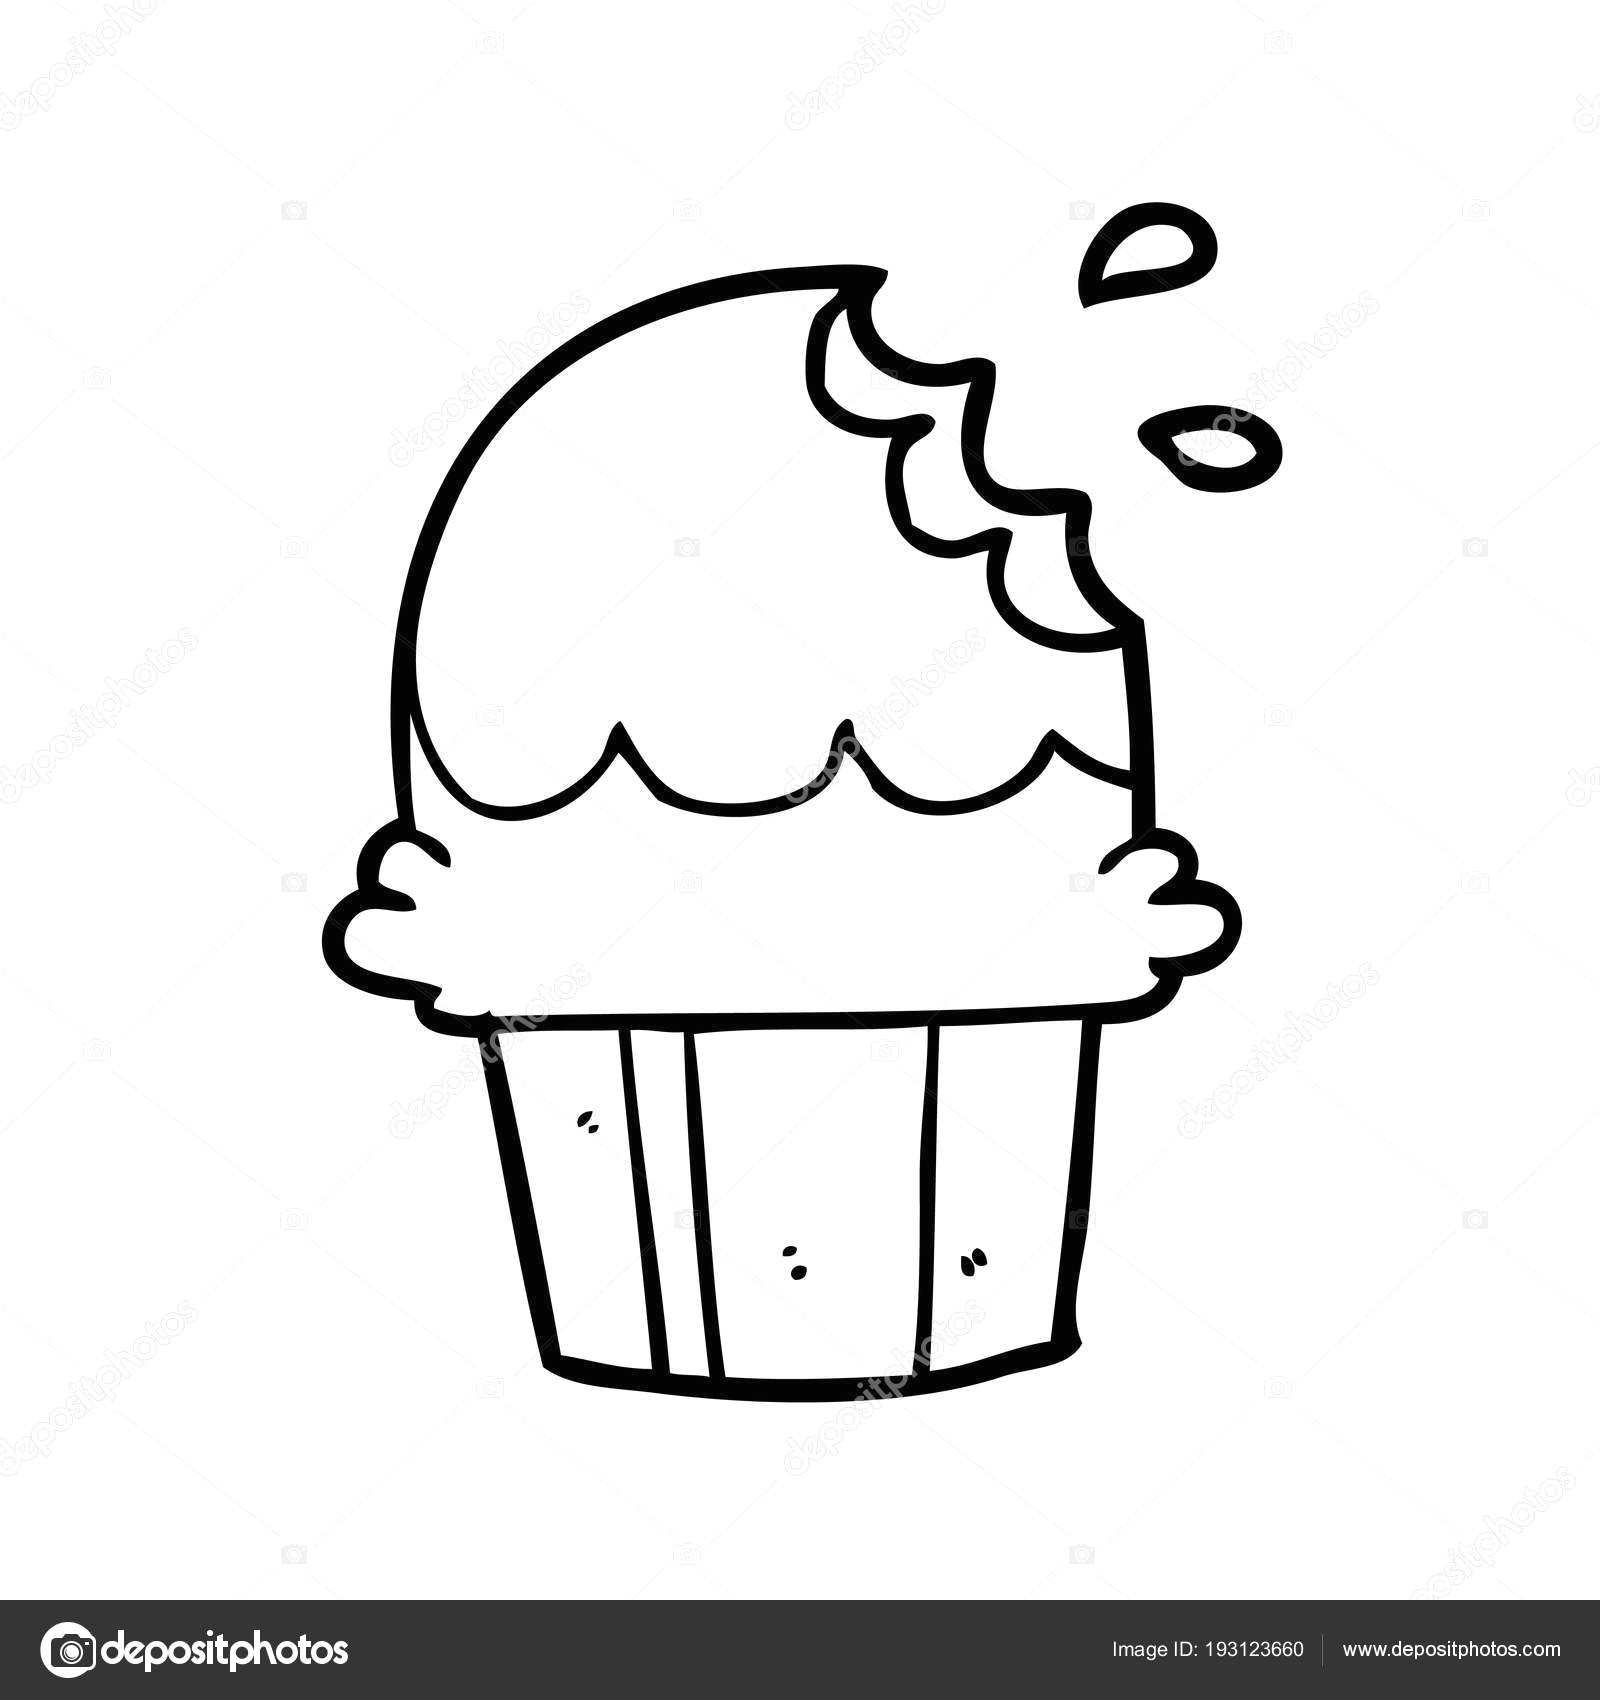 neymar jr drawing easy 2 cupcake drawing graphic for free on ayoqq of neymar jr drawing